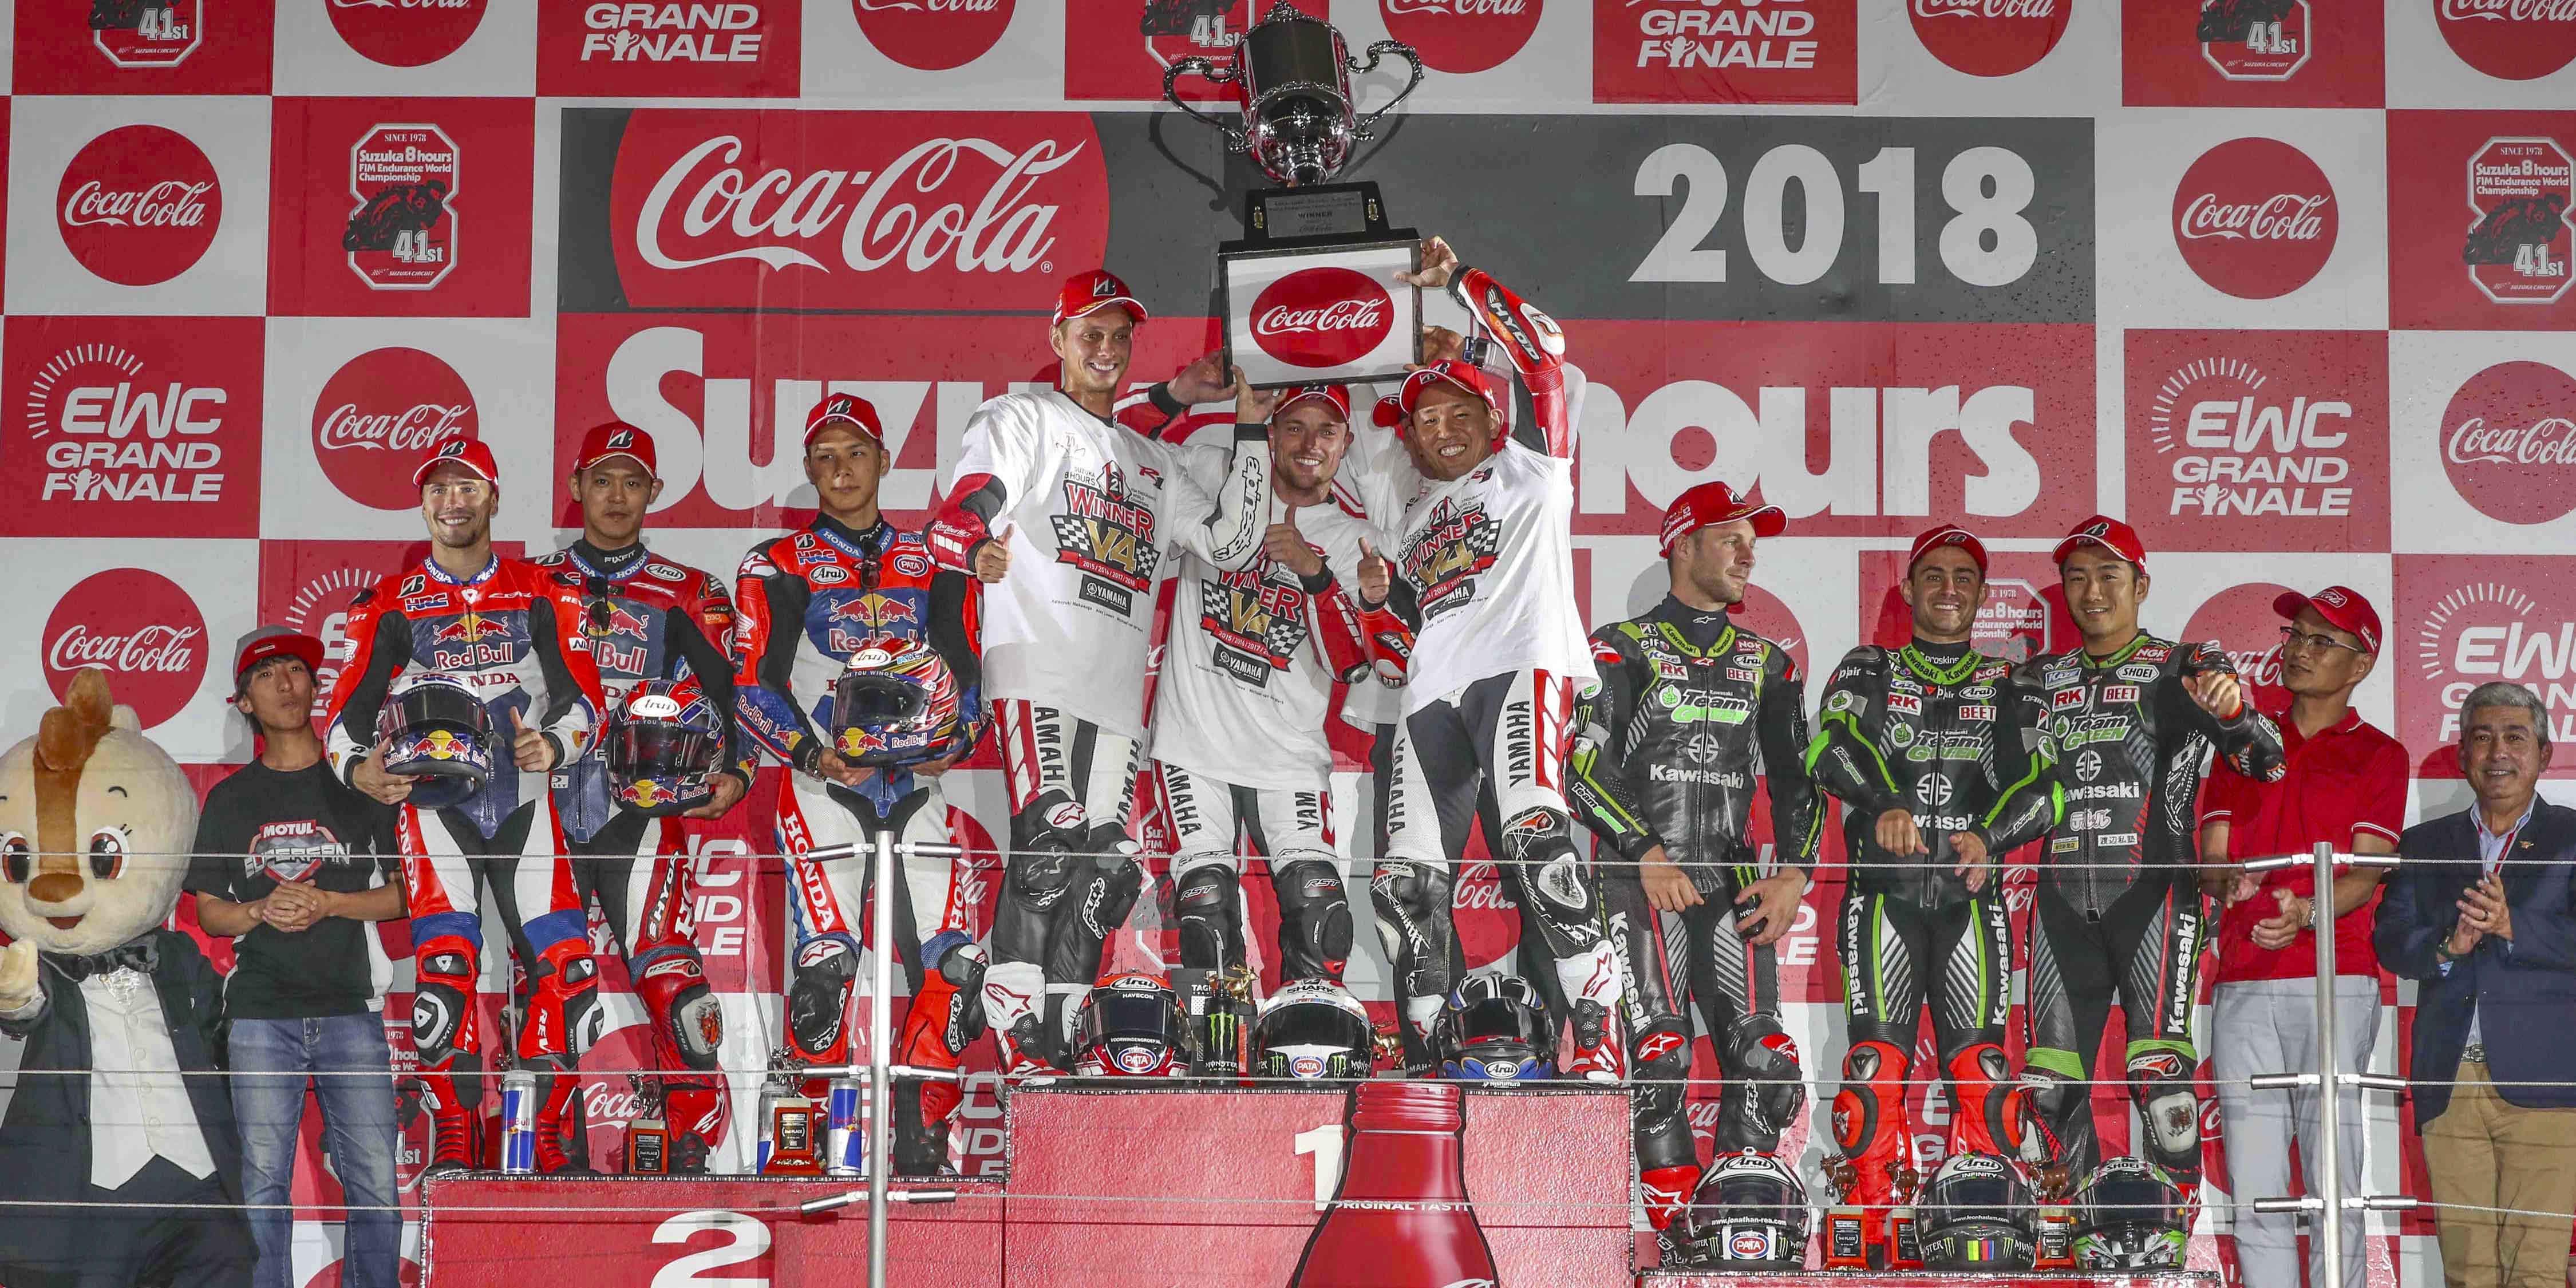 Yamaha Factory Racing Team claims fourth win at Suzuka   –   F.C.C. TSR Honda France, the first Japanese team World champion